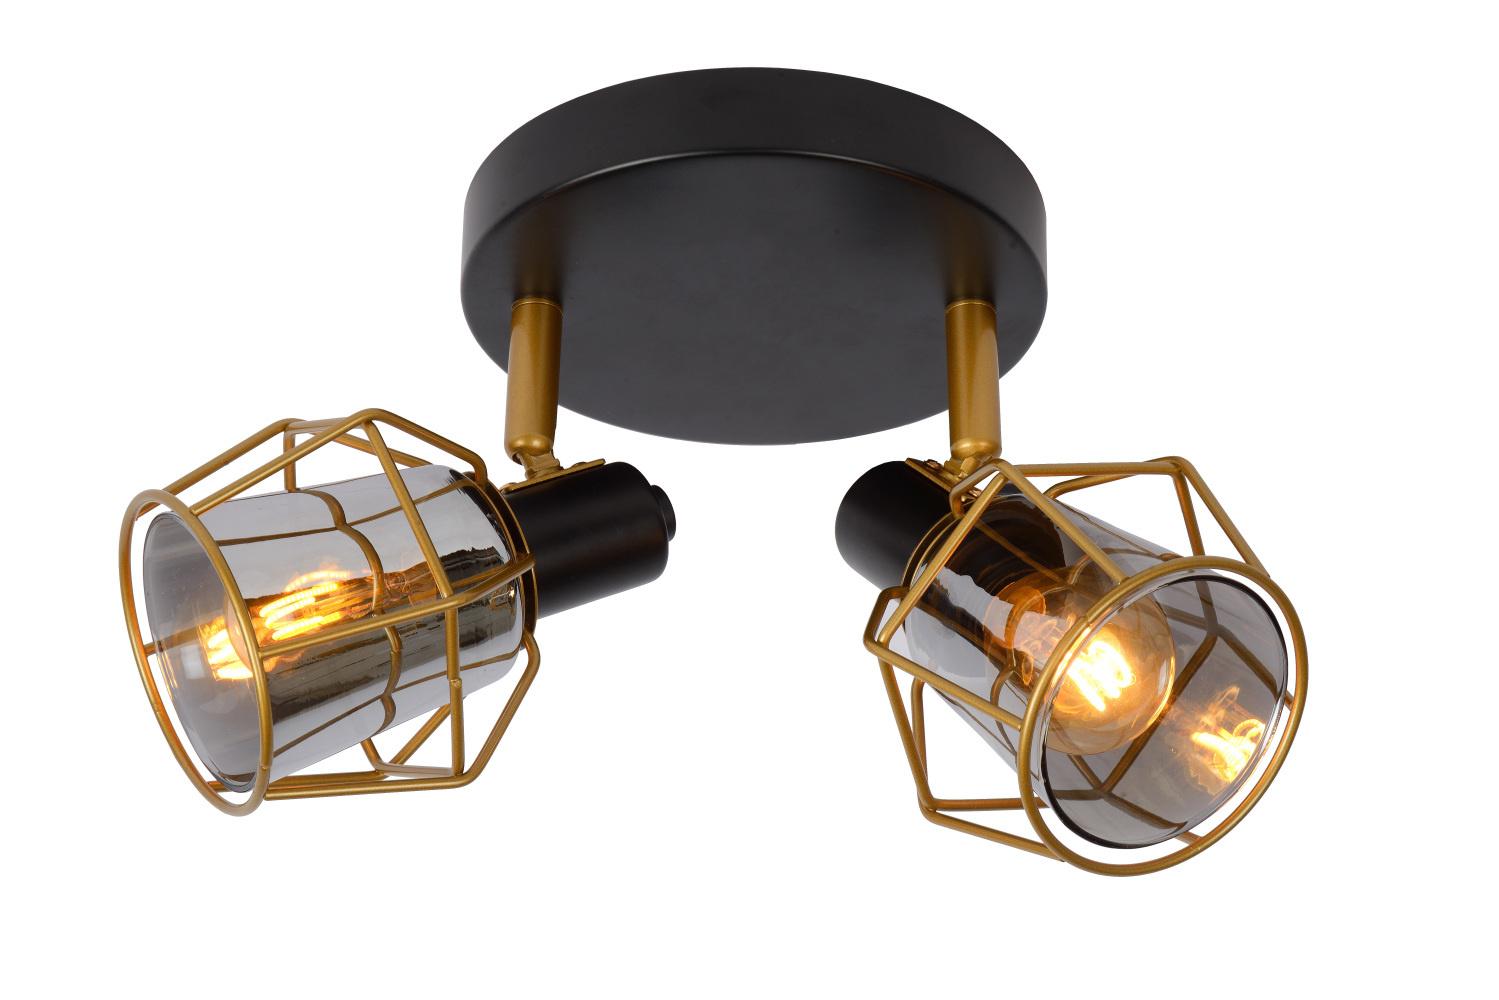 Lucide NILA Plafondspot 2x E14/25W Zwart / Smoke Glas